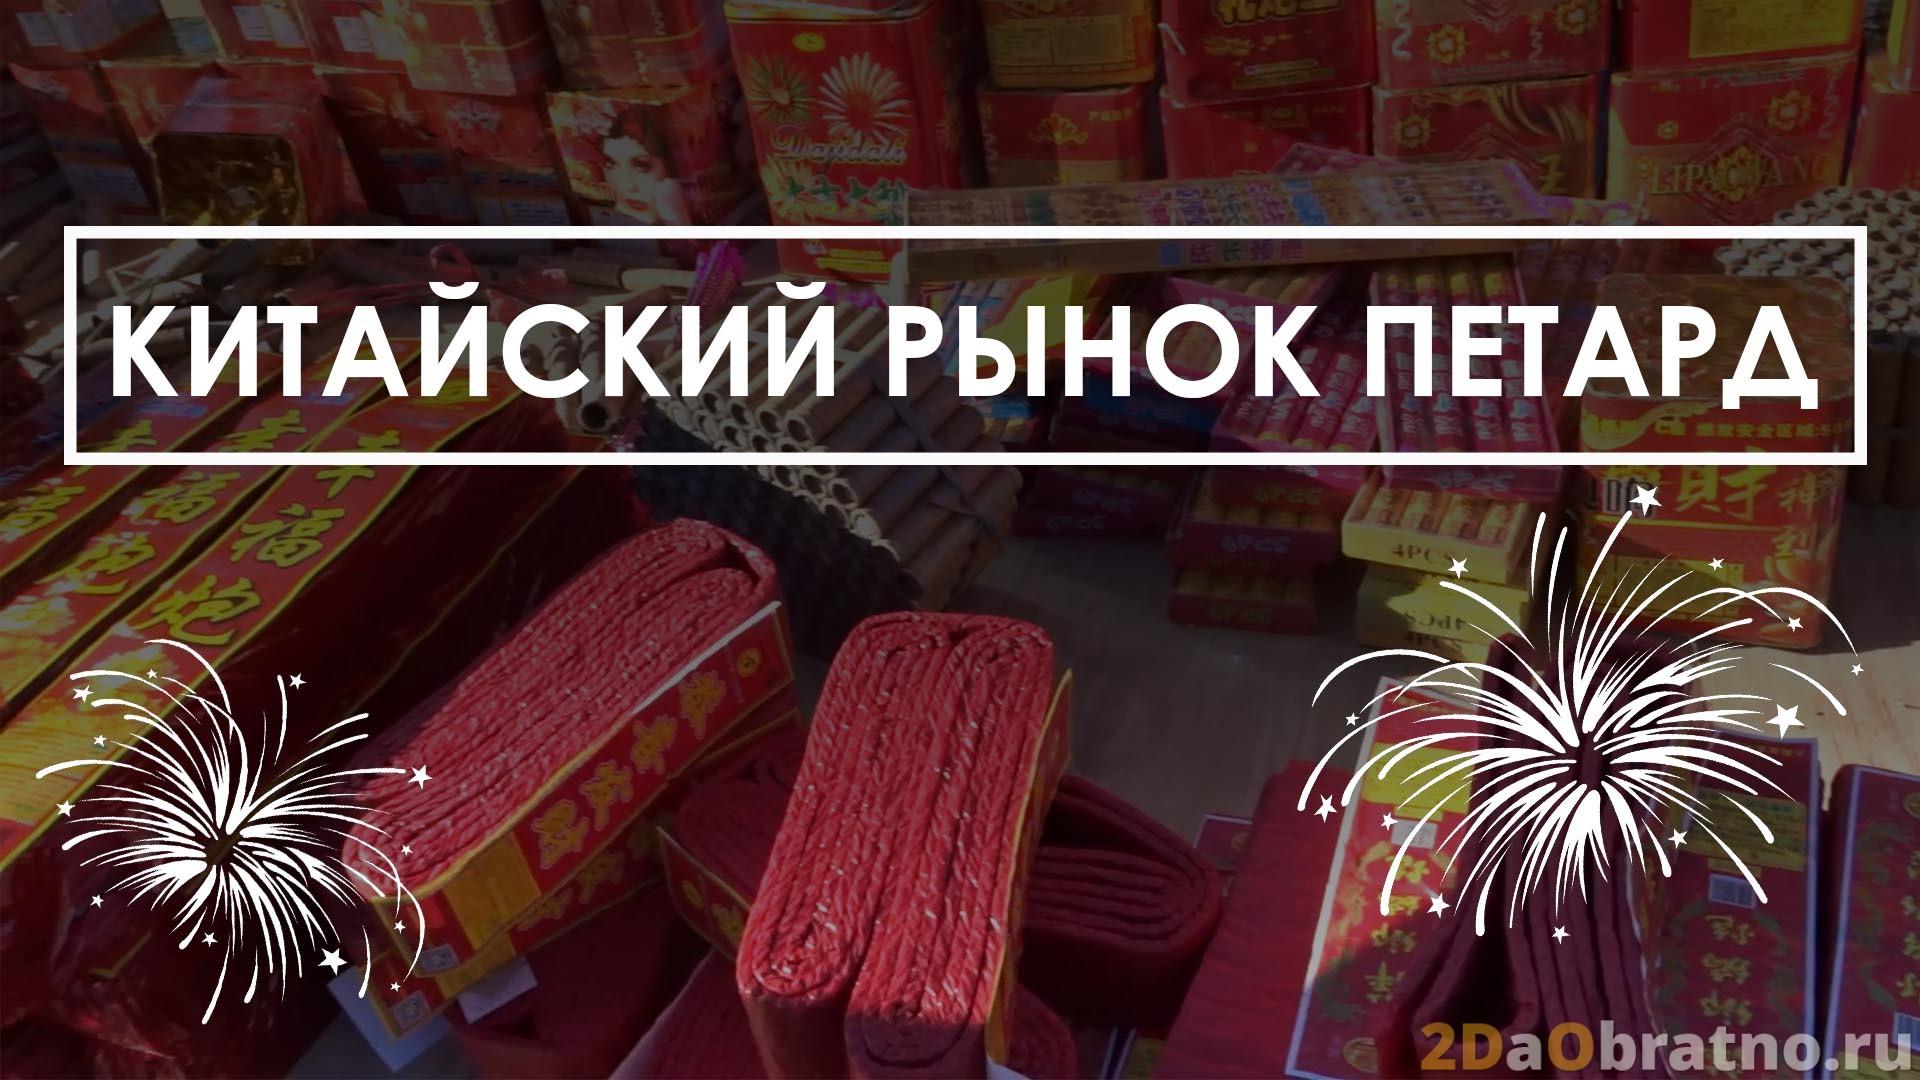 Китайский рынок петард и пиротехники